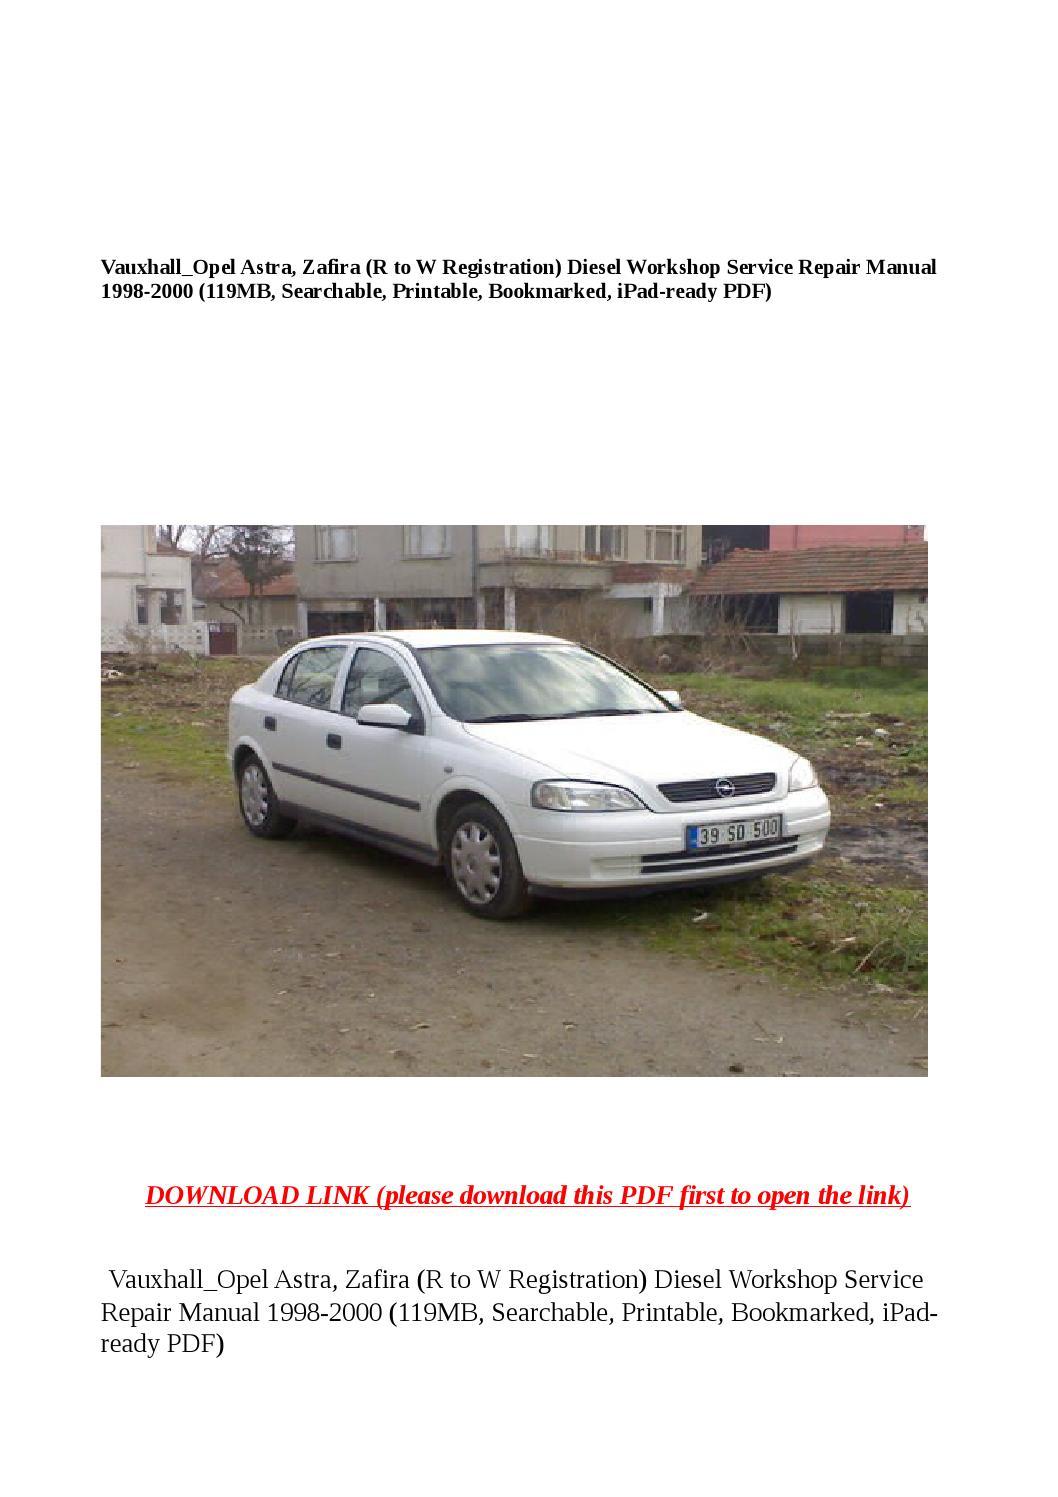 Vauxhall opel astra, zafira (r to w registration) diesel workshop service  repair manual 1998 2000 (1 by buhbu - issuu